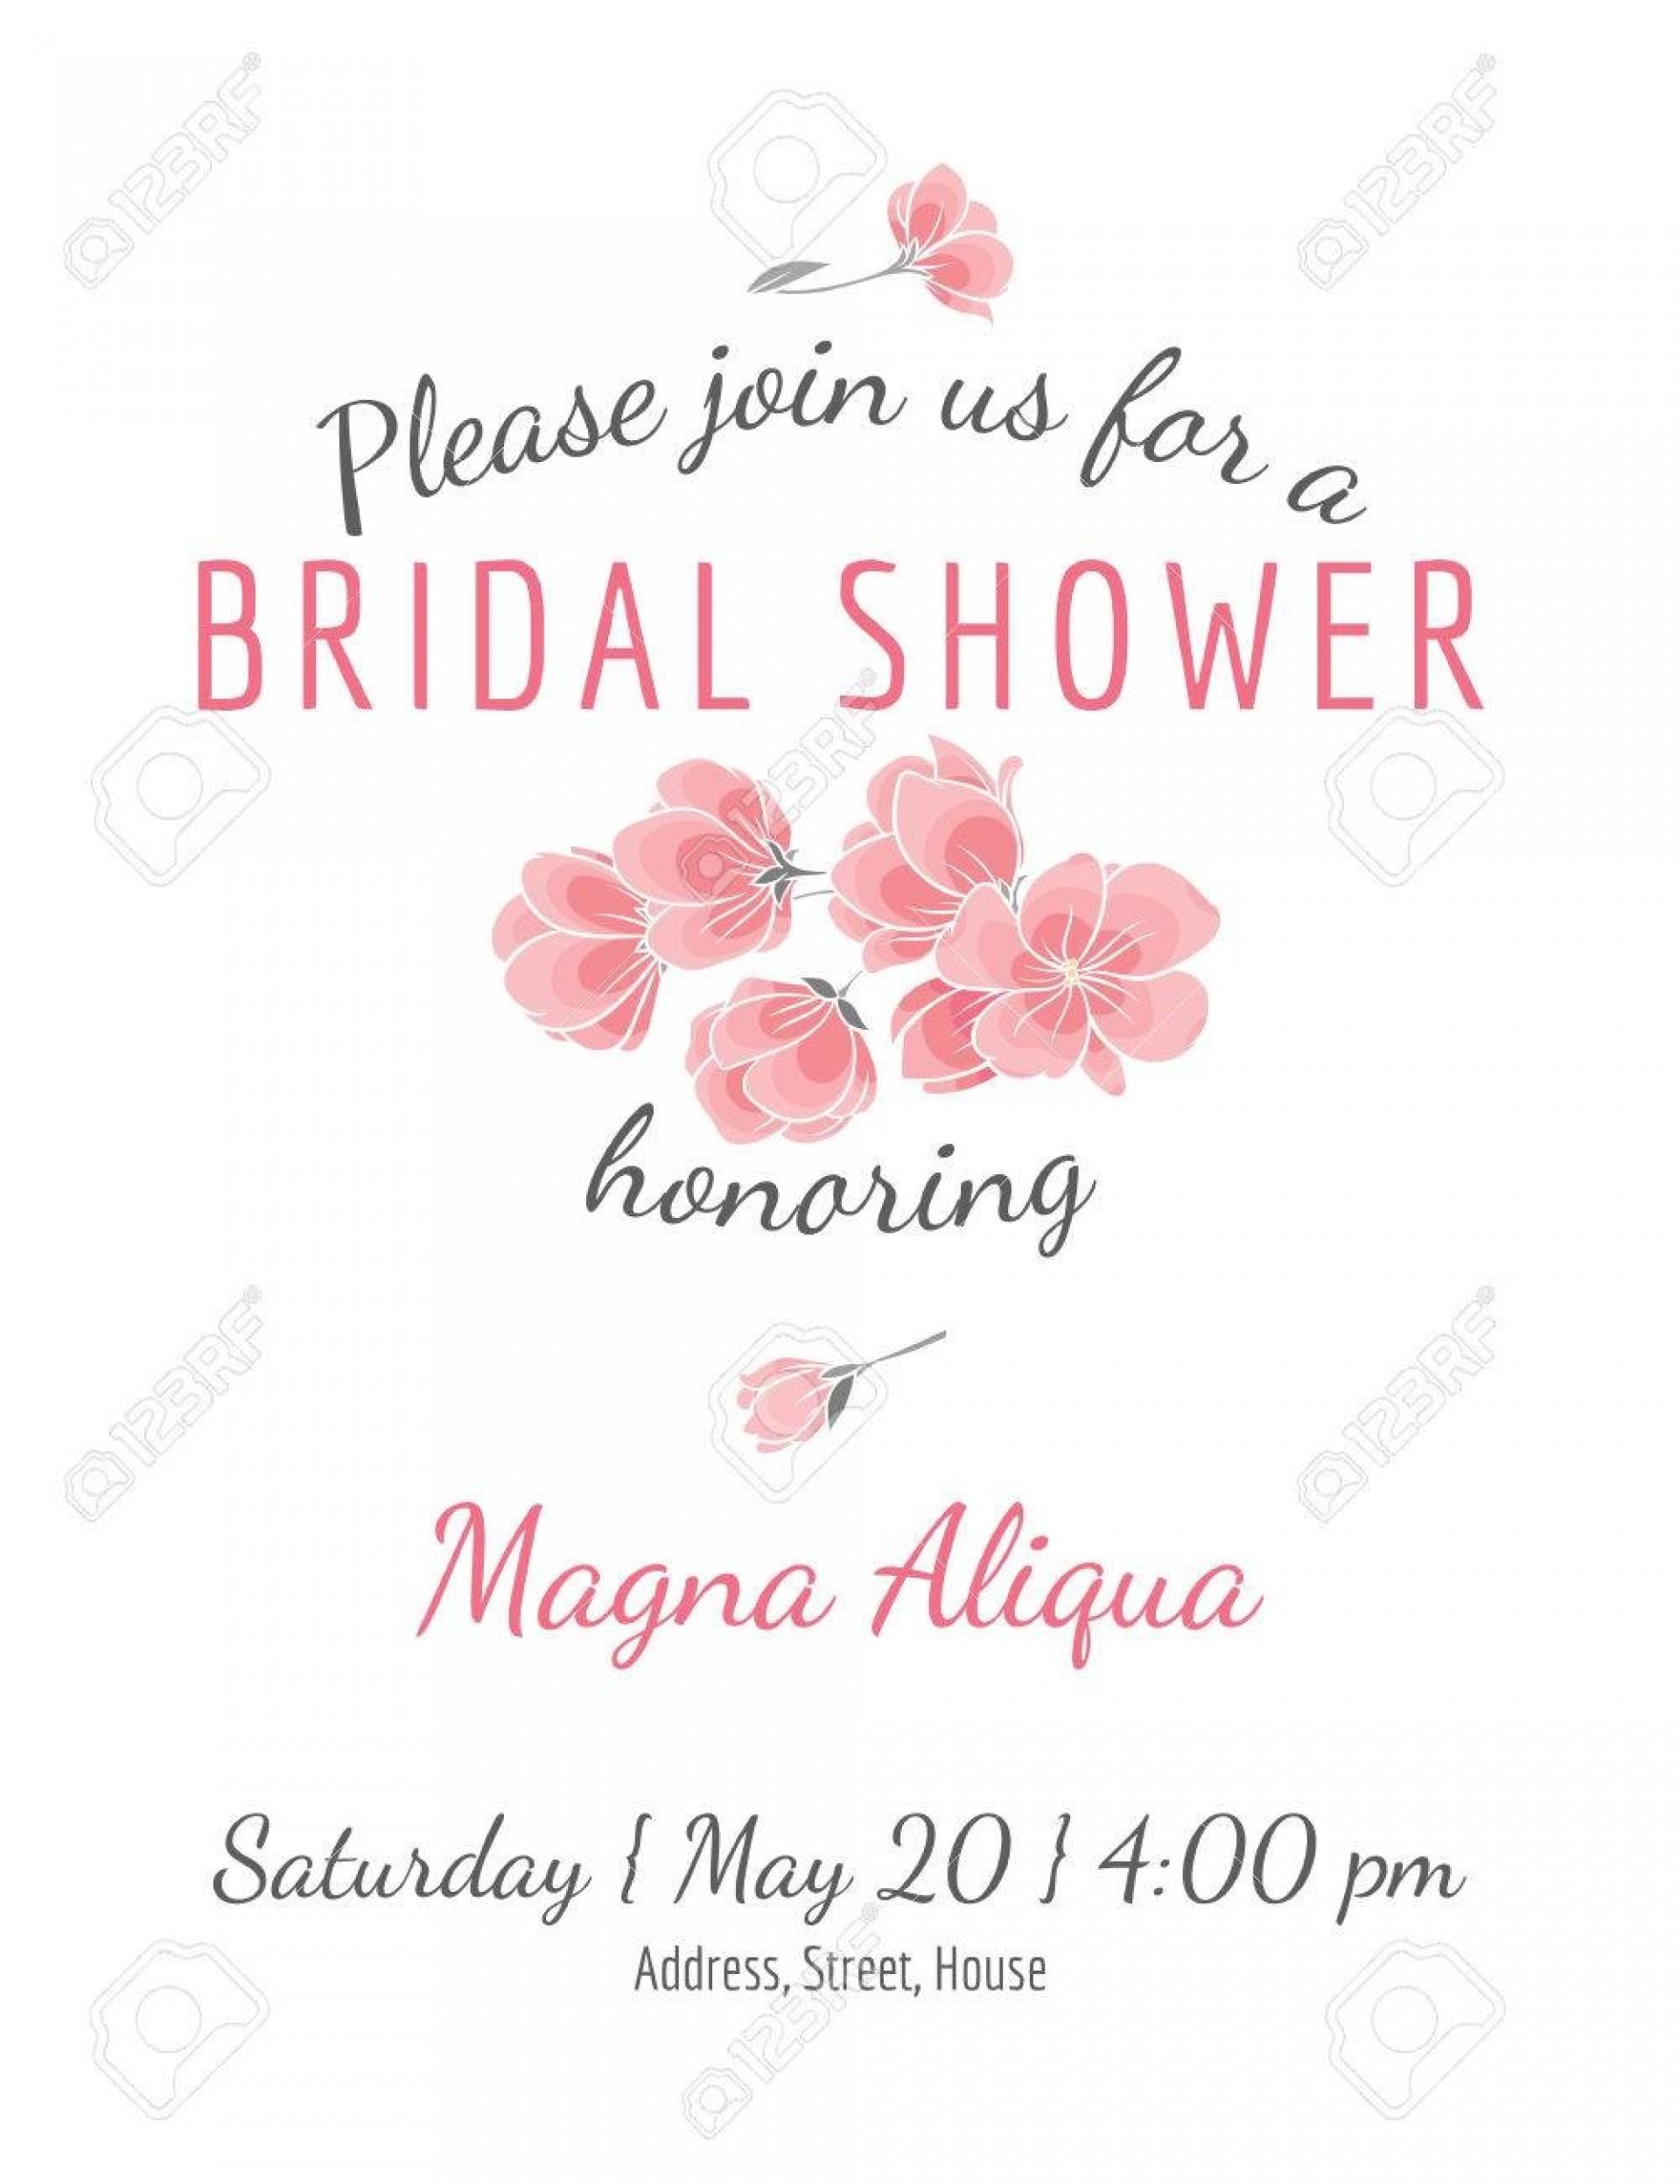 002 Unforgettable Bridal Shower Card Template High Definition  Invitation Free Download Bingo1920